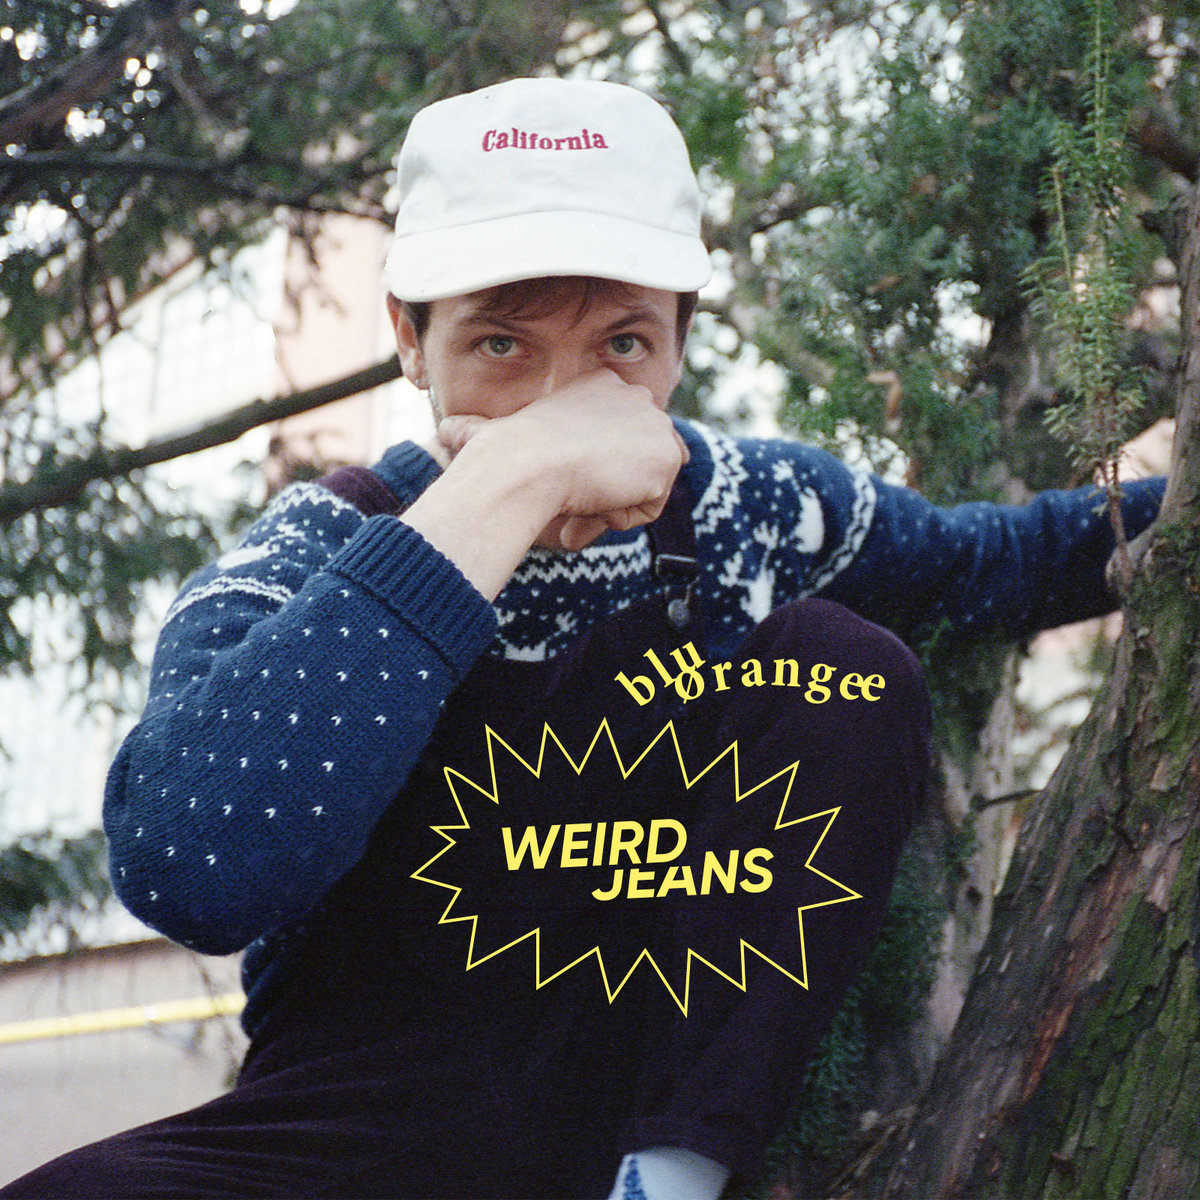 Bluorangee – WeirdJeans